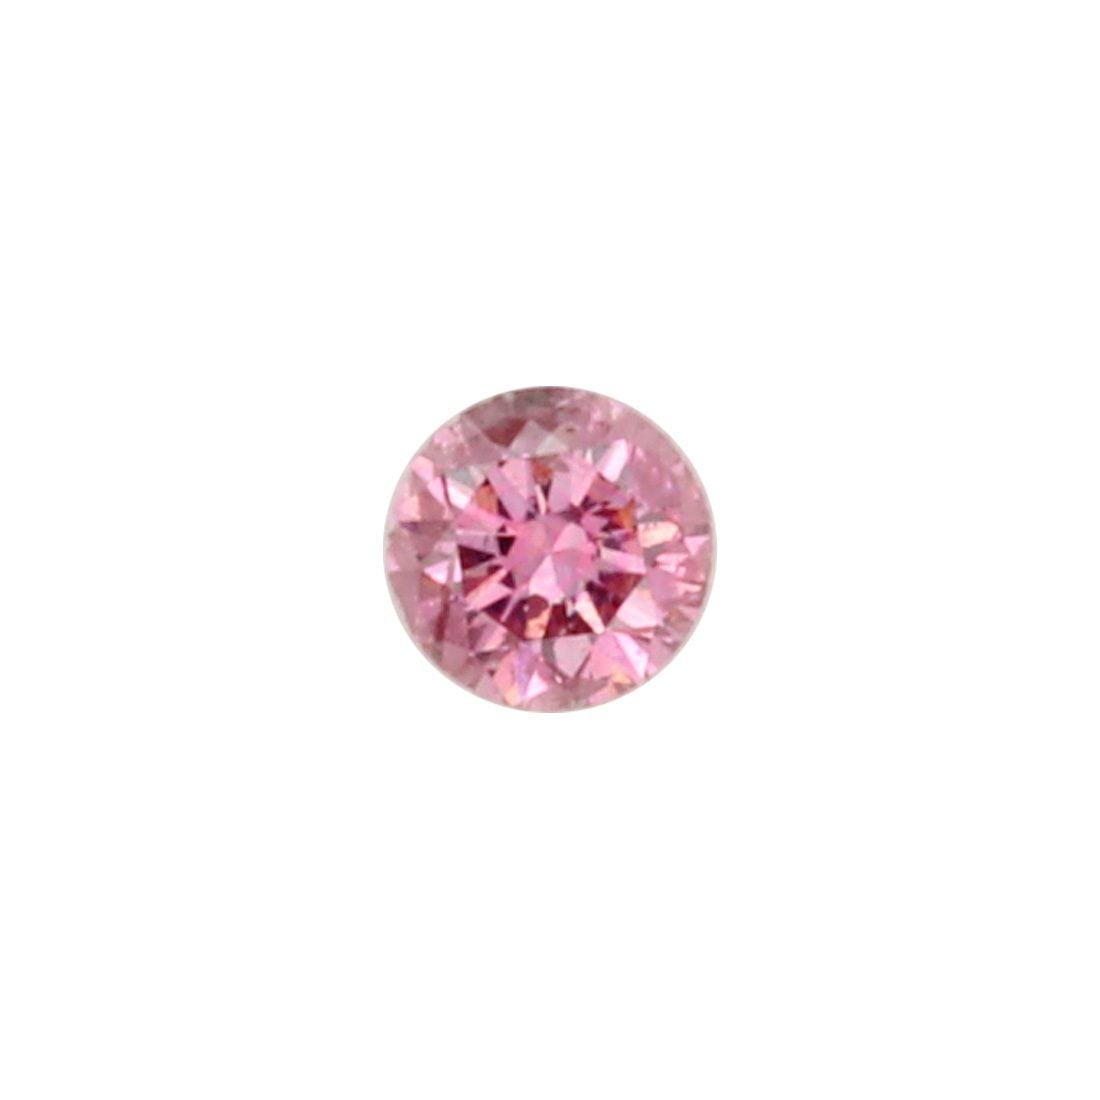 0.07ct Natural Fancy Deep Pink, 3P Argyle Diamond